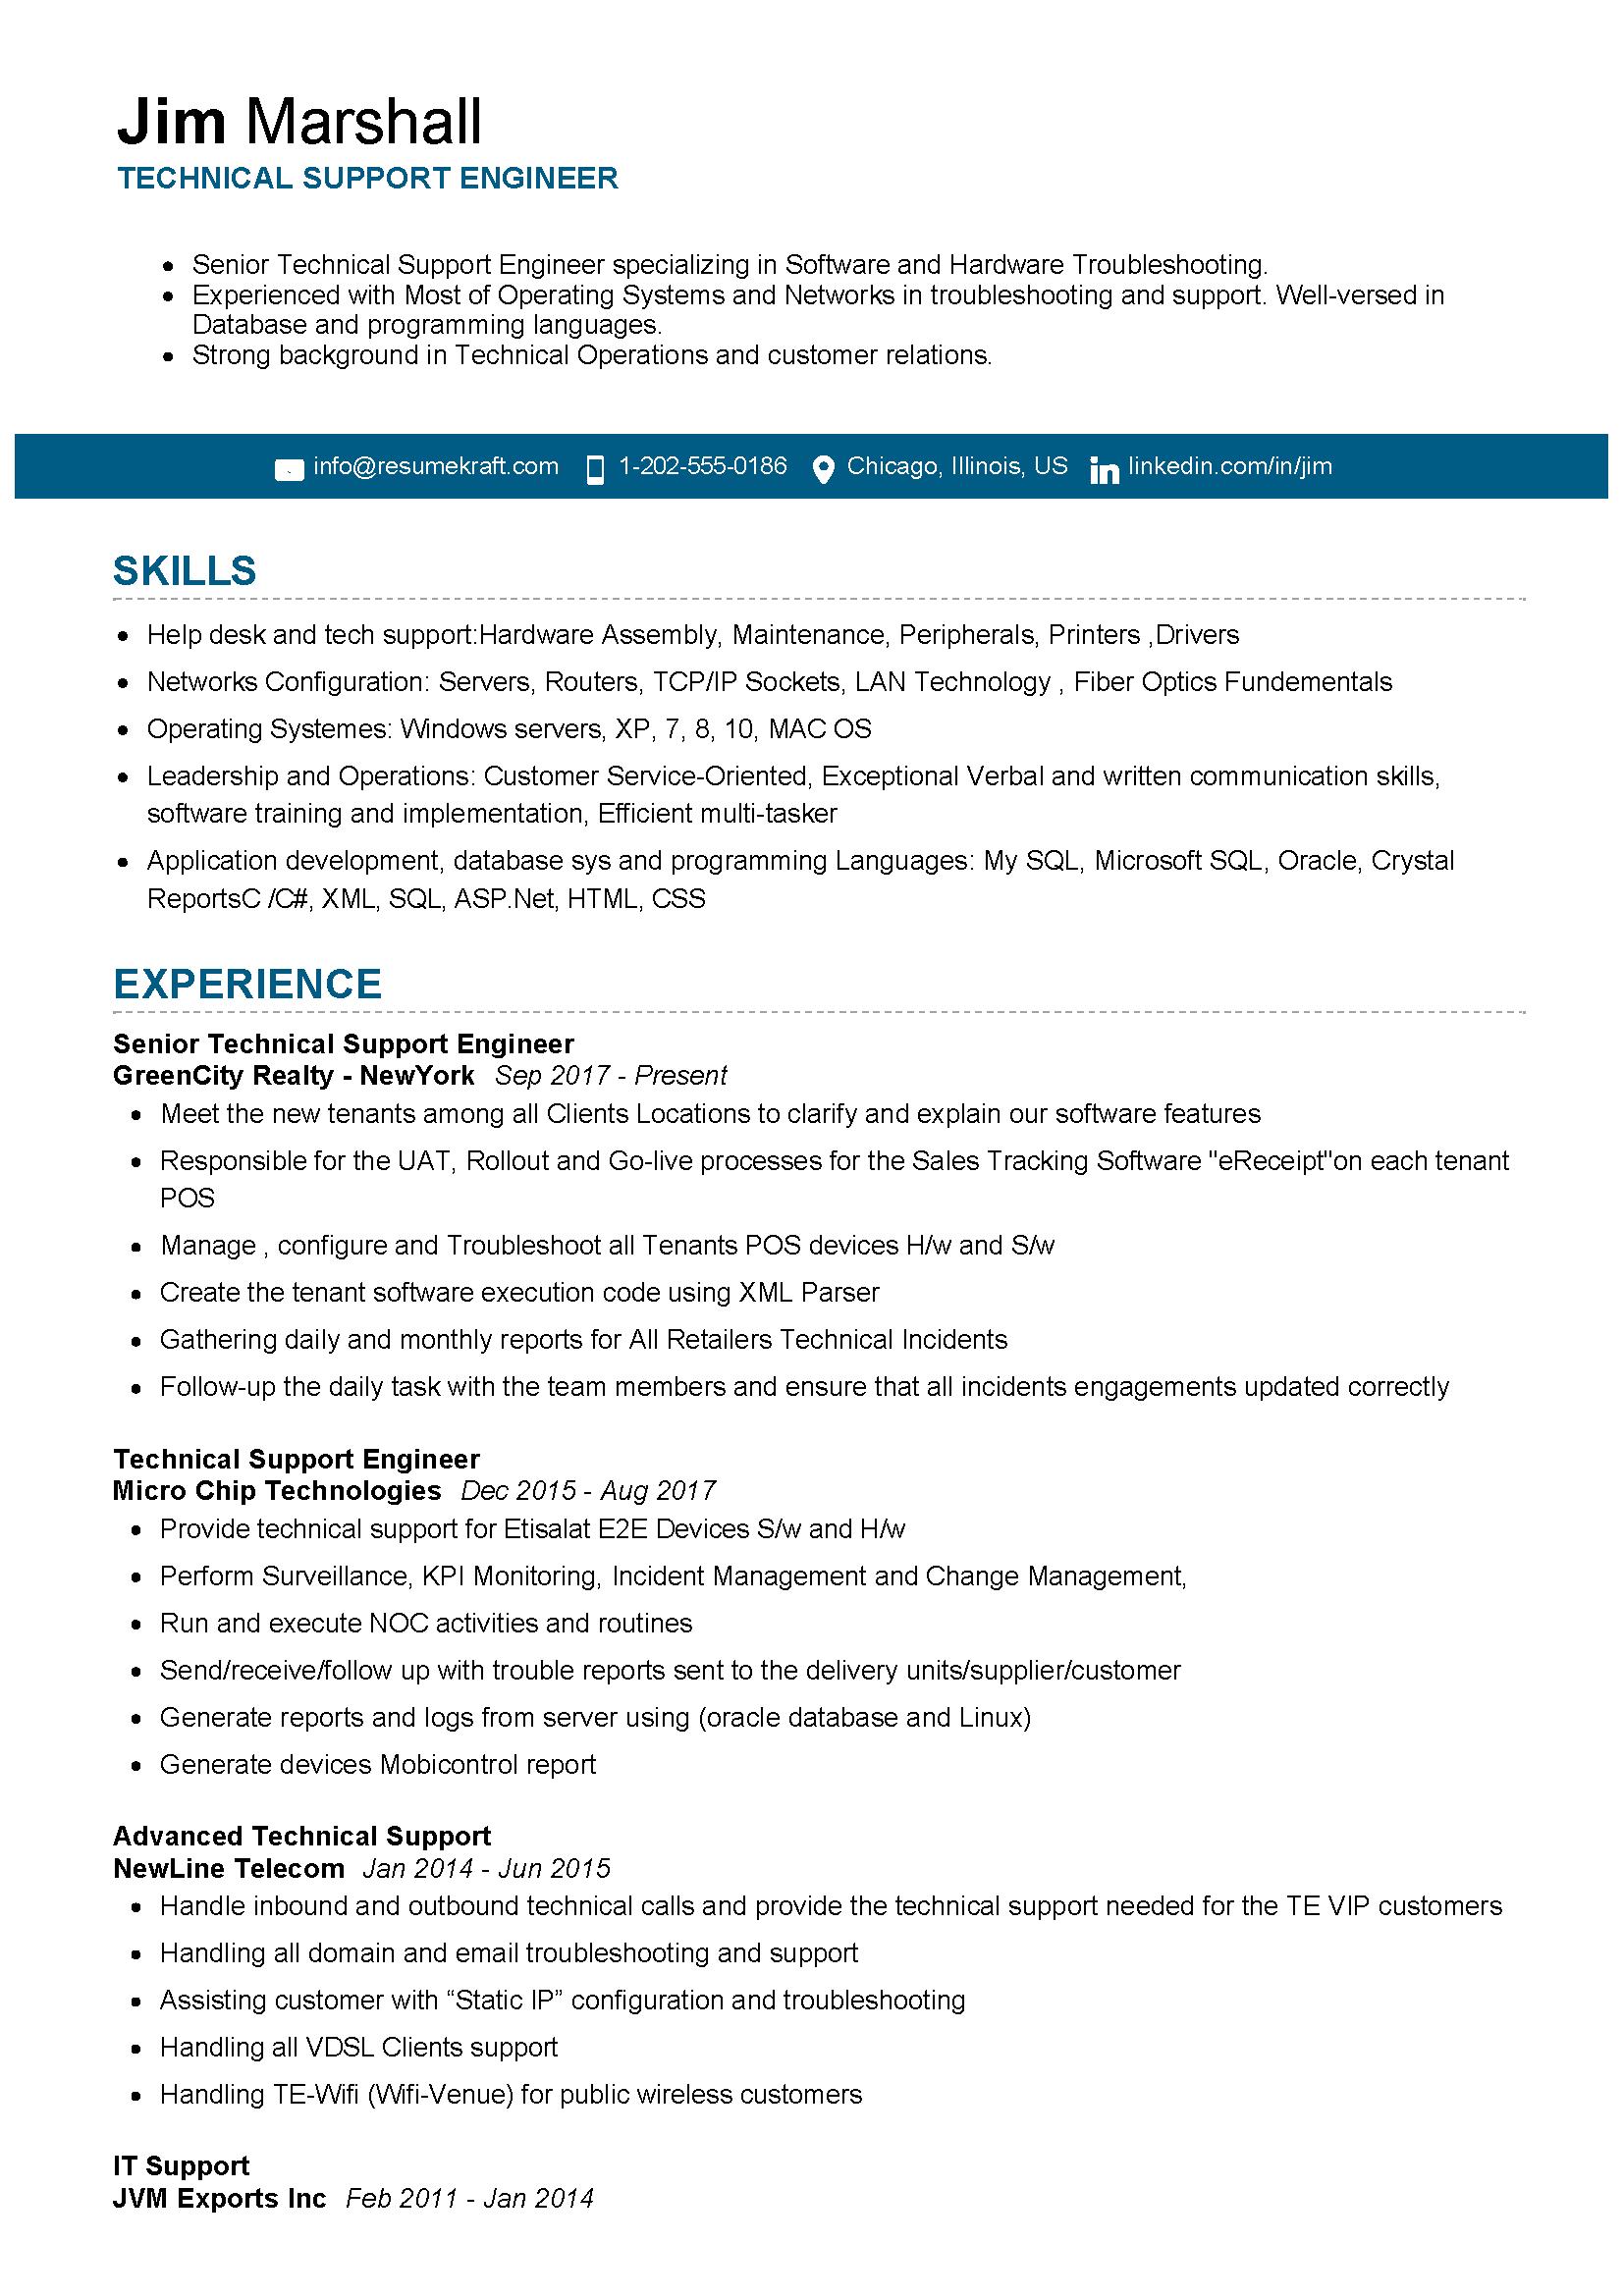 Technical Support Engineer Sample Resume In 2020 Professional Resume Samples Resume Best Resume Format